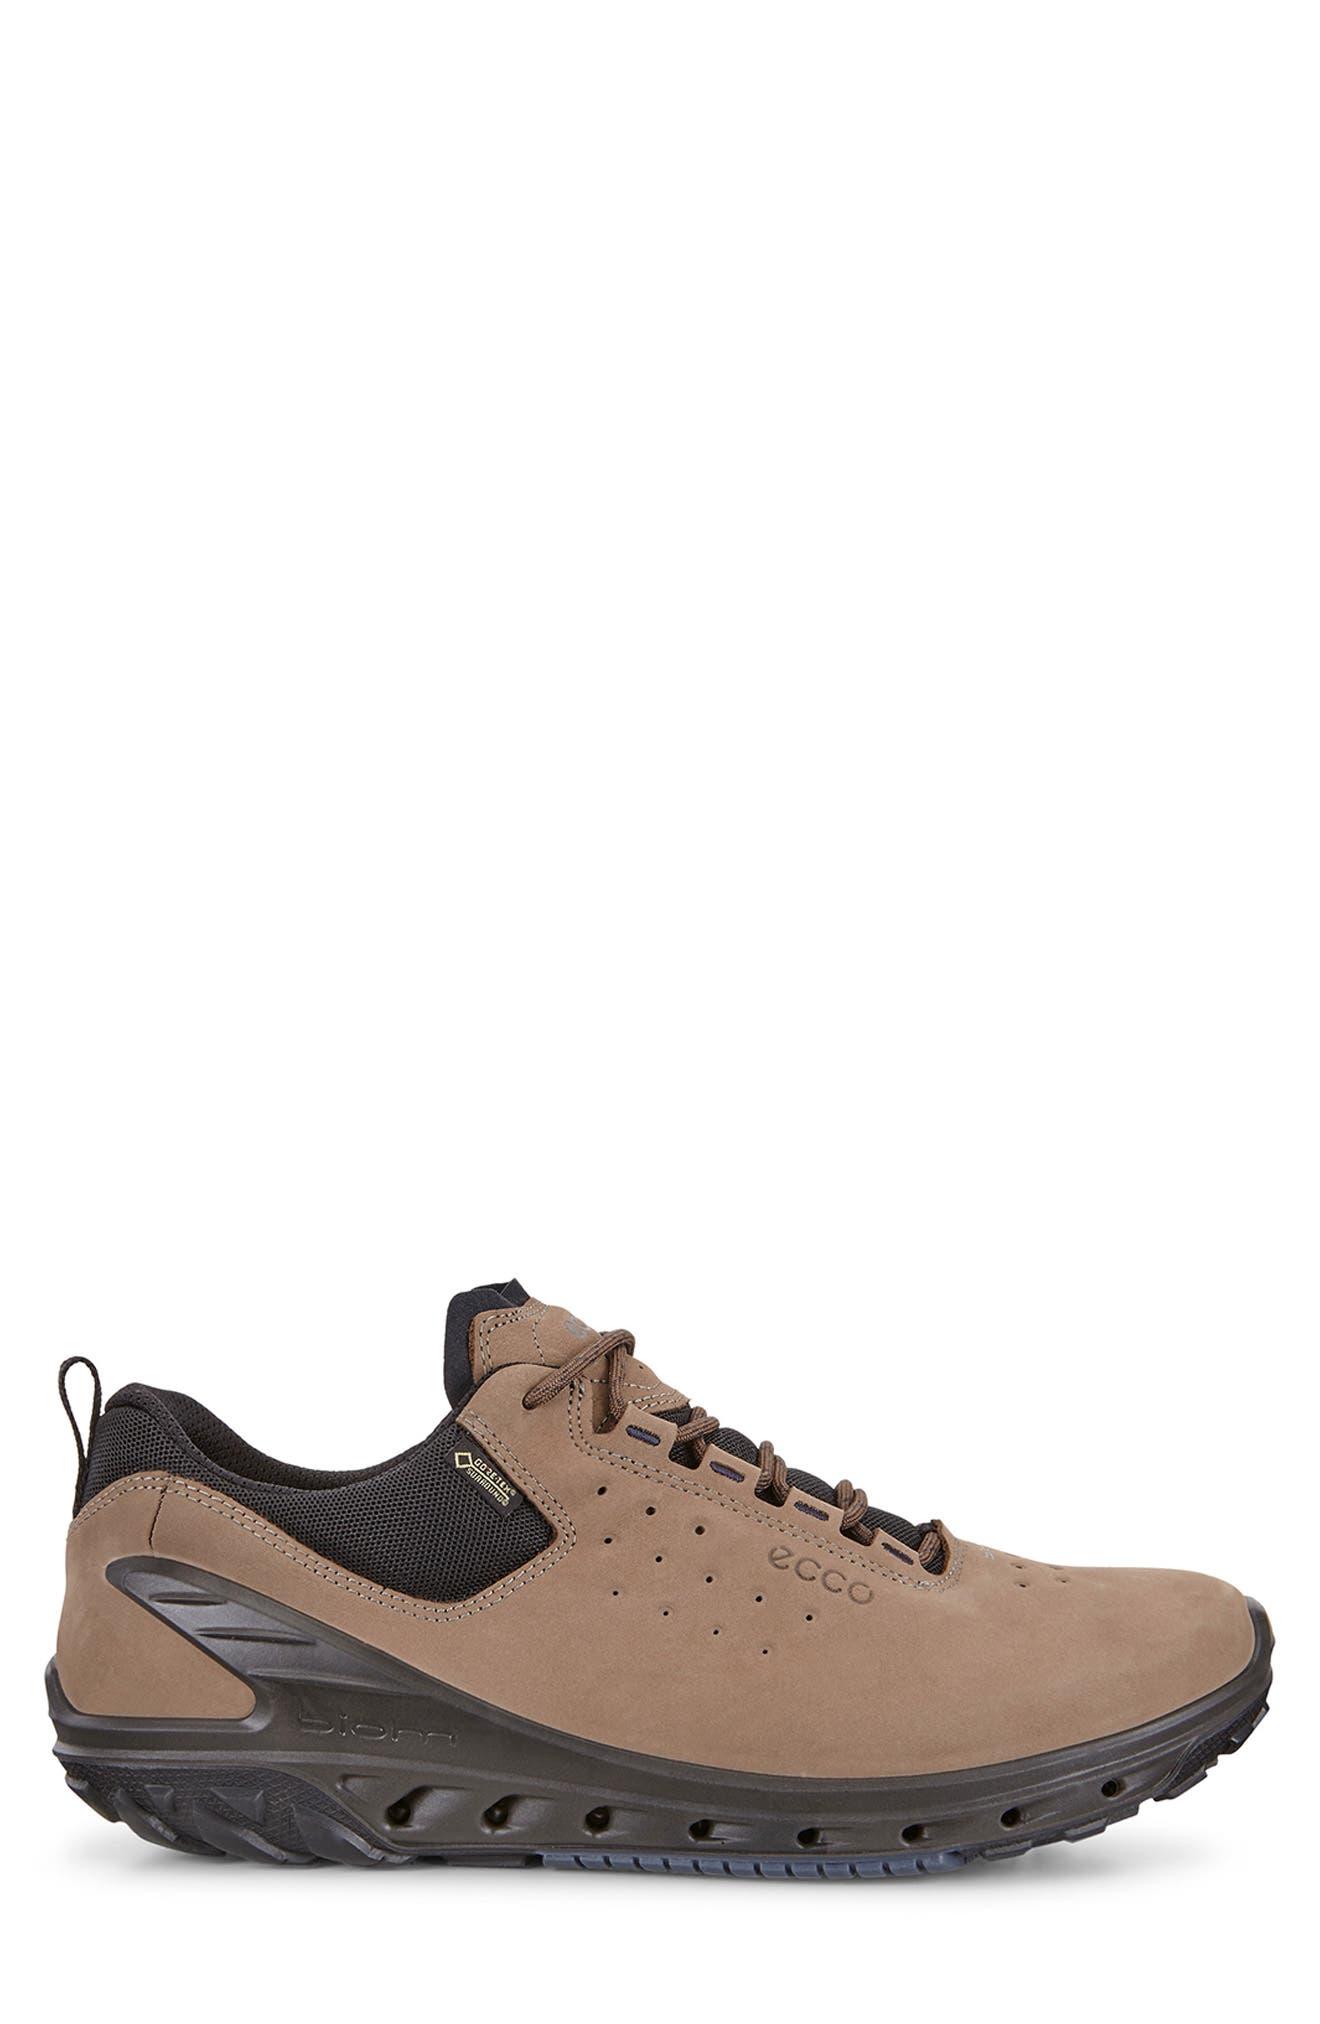 Biom Venture GTX Sneaker,                             Alternate thumbnail 2, color,                             BIRCH BROWN LEATHER